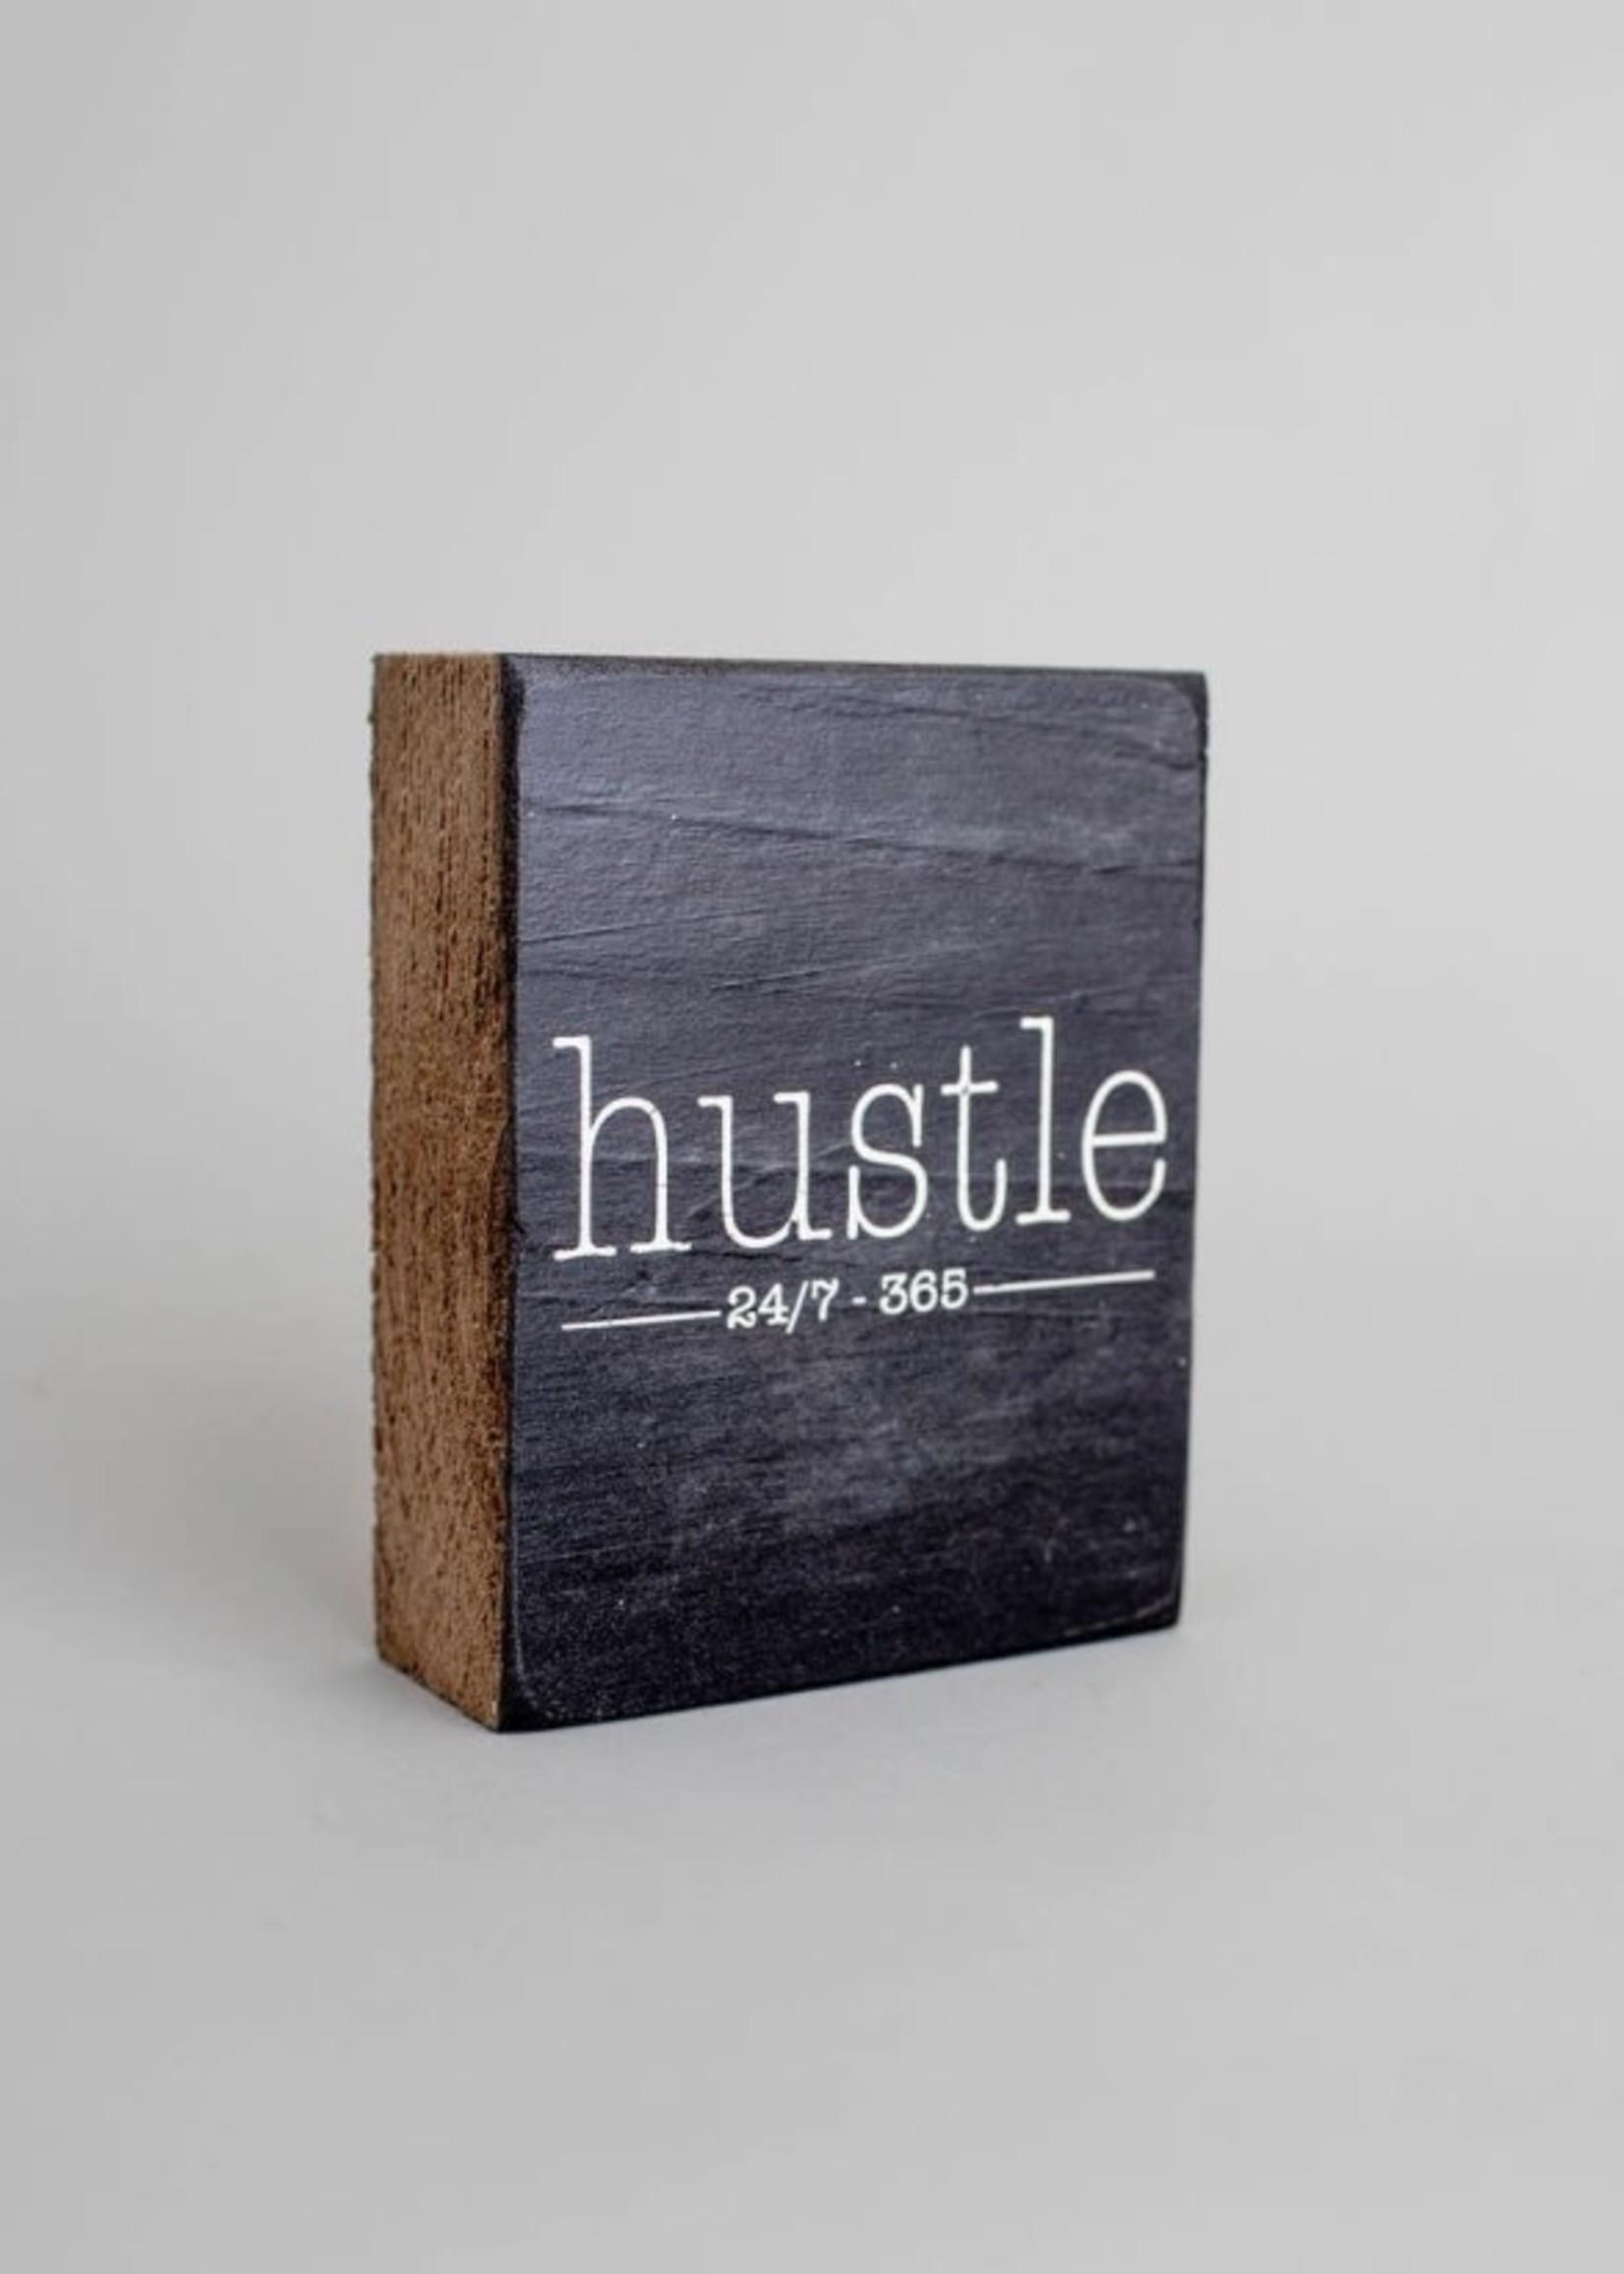 Rustic Marlin Hustle Rustic Block